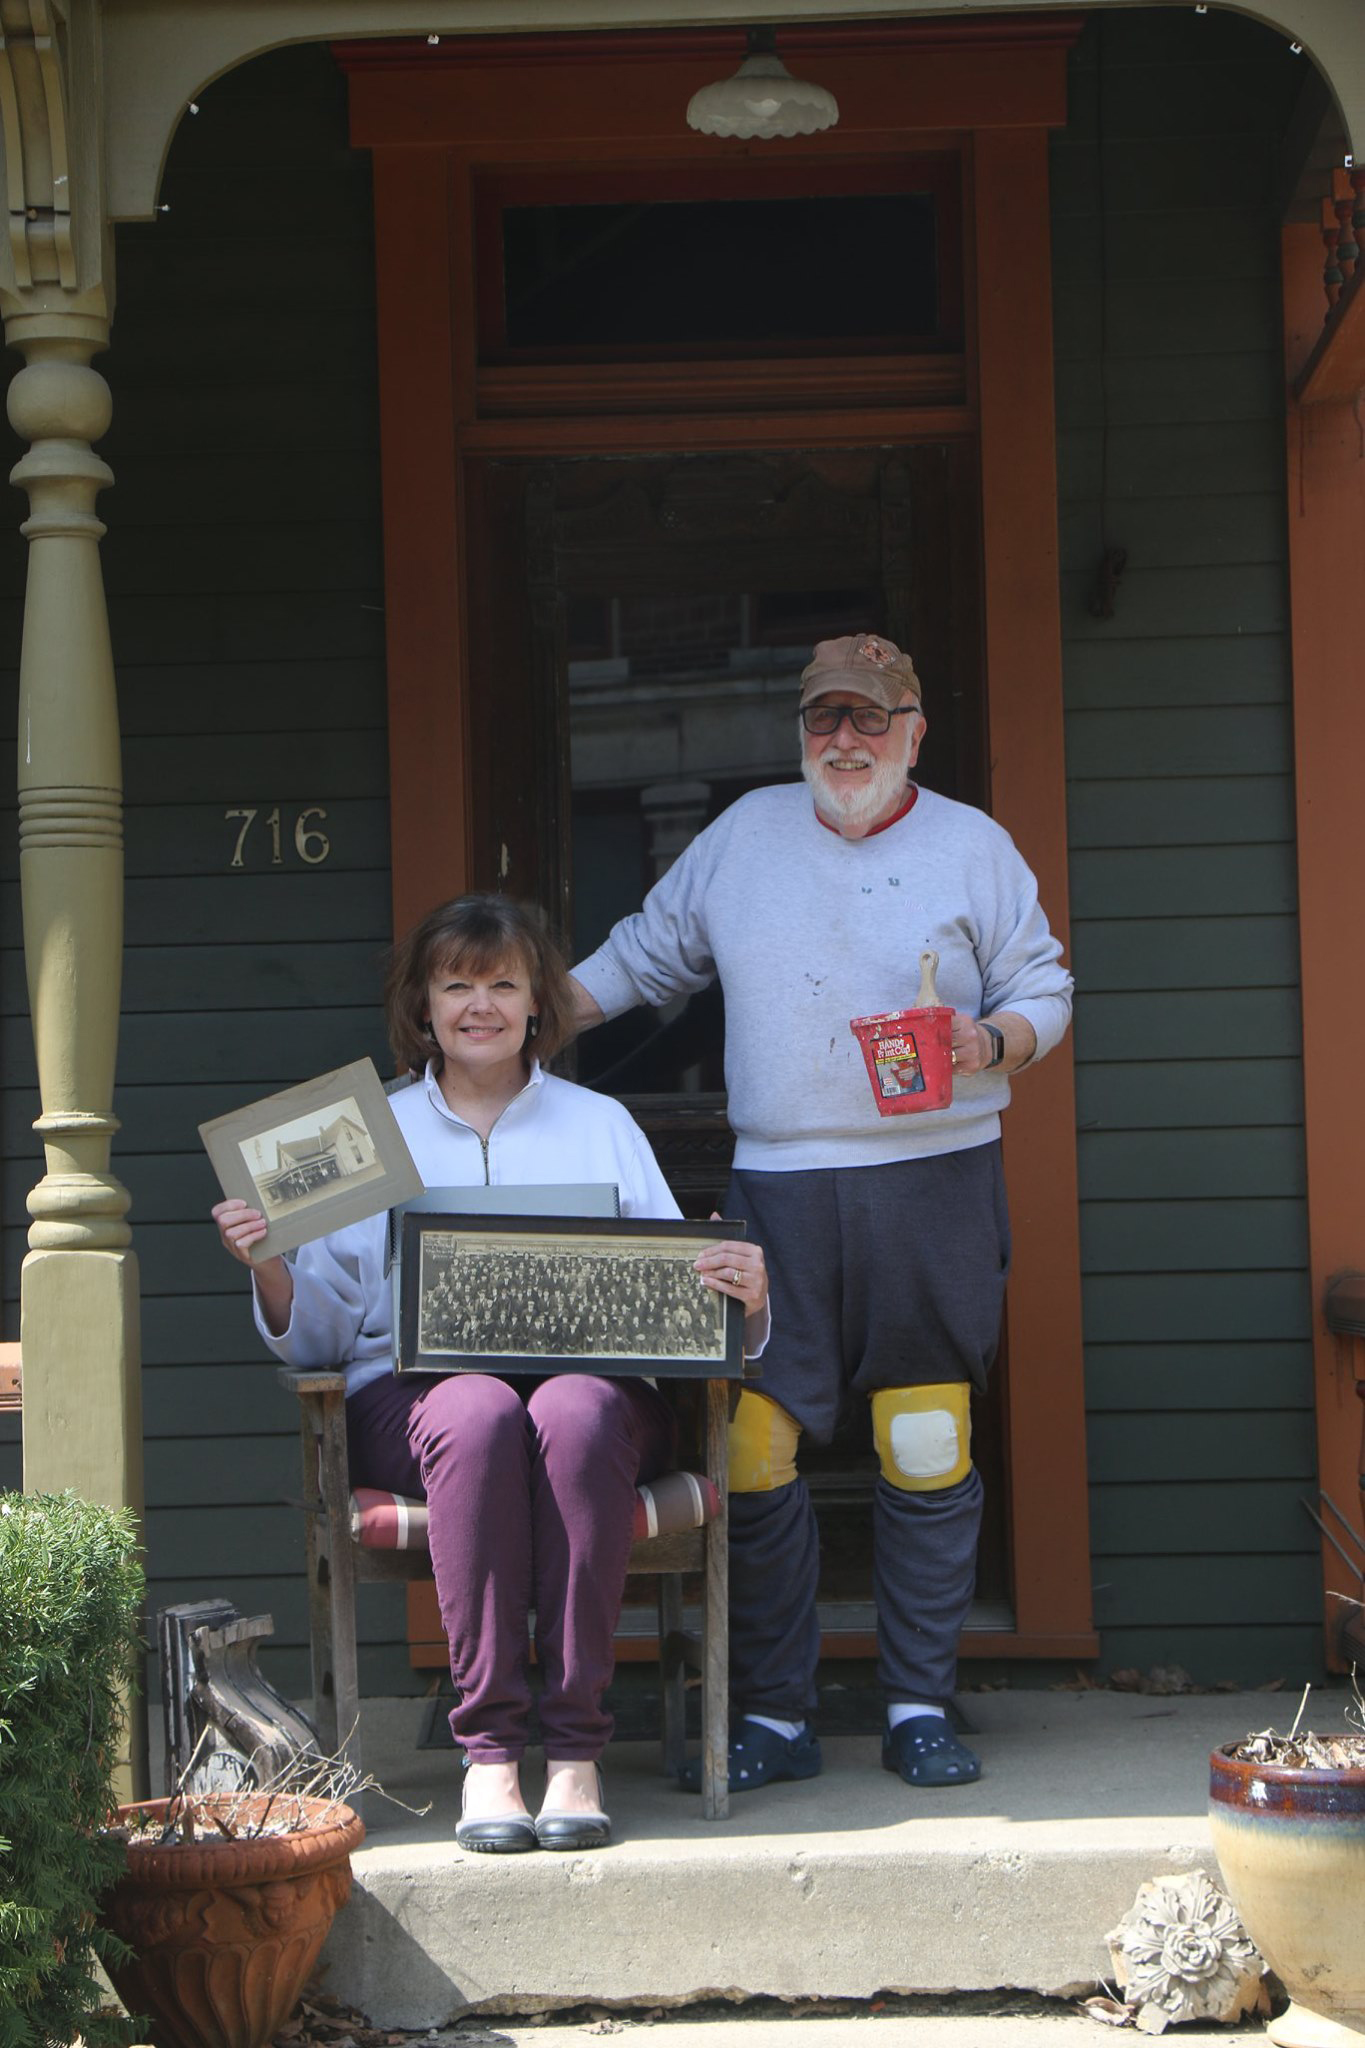 Joan Hostetler and John Harris